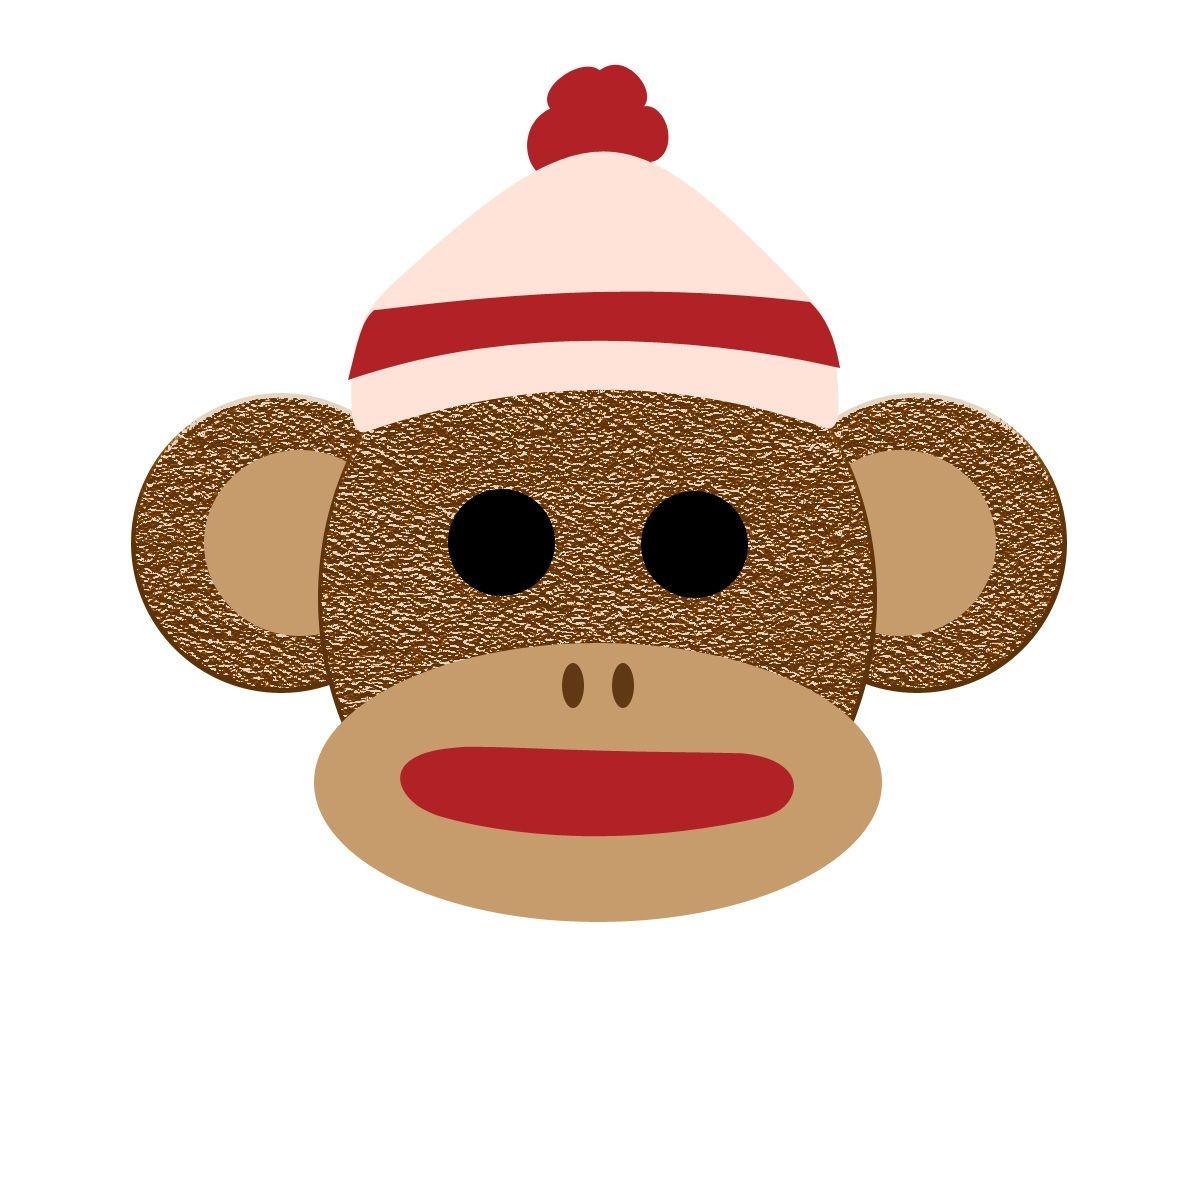 Printable Sock Monkey Clip Art For Free – 101 Clip Art | Monkey - Free Printable Sock Monkey Clip Art